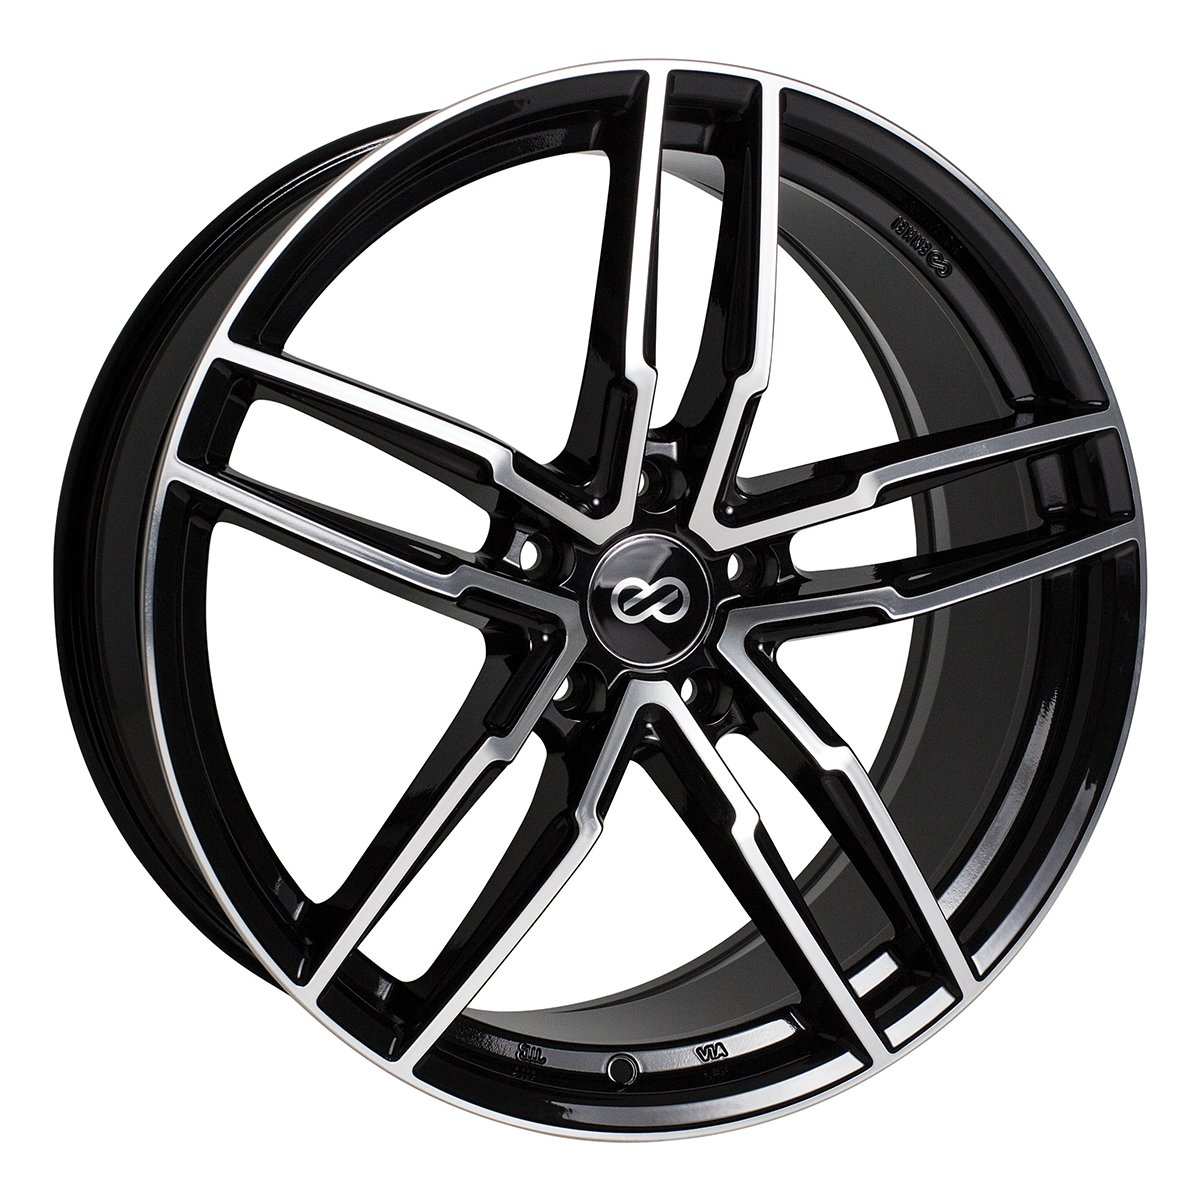 20'' Enkei SS05 Performance Wheel Rim Black 20x8.5 5x114.3 +38 511-285-6538BKM